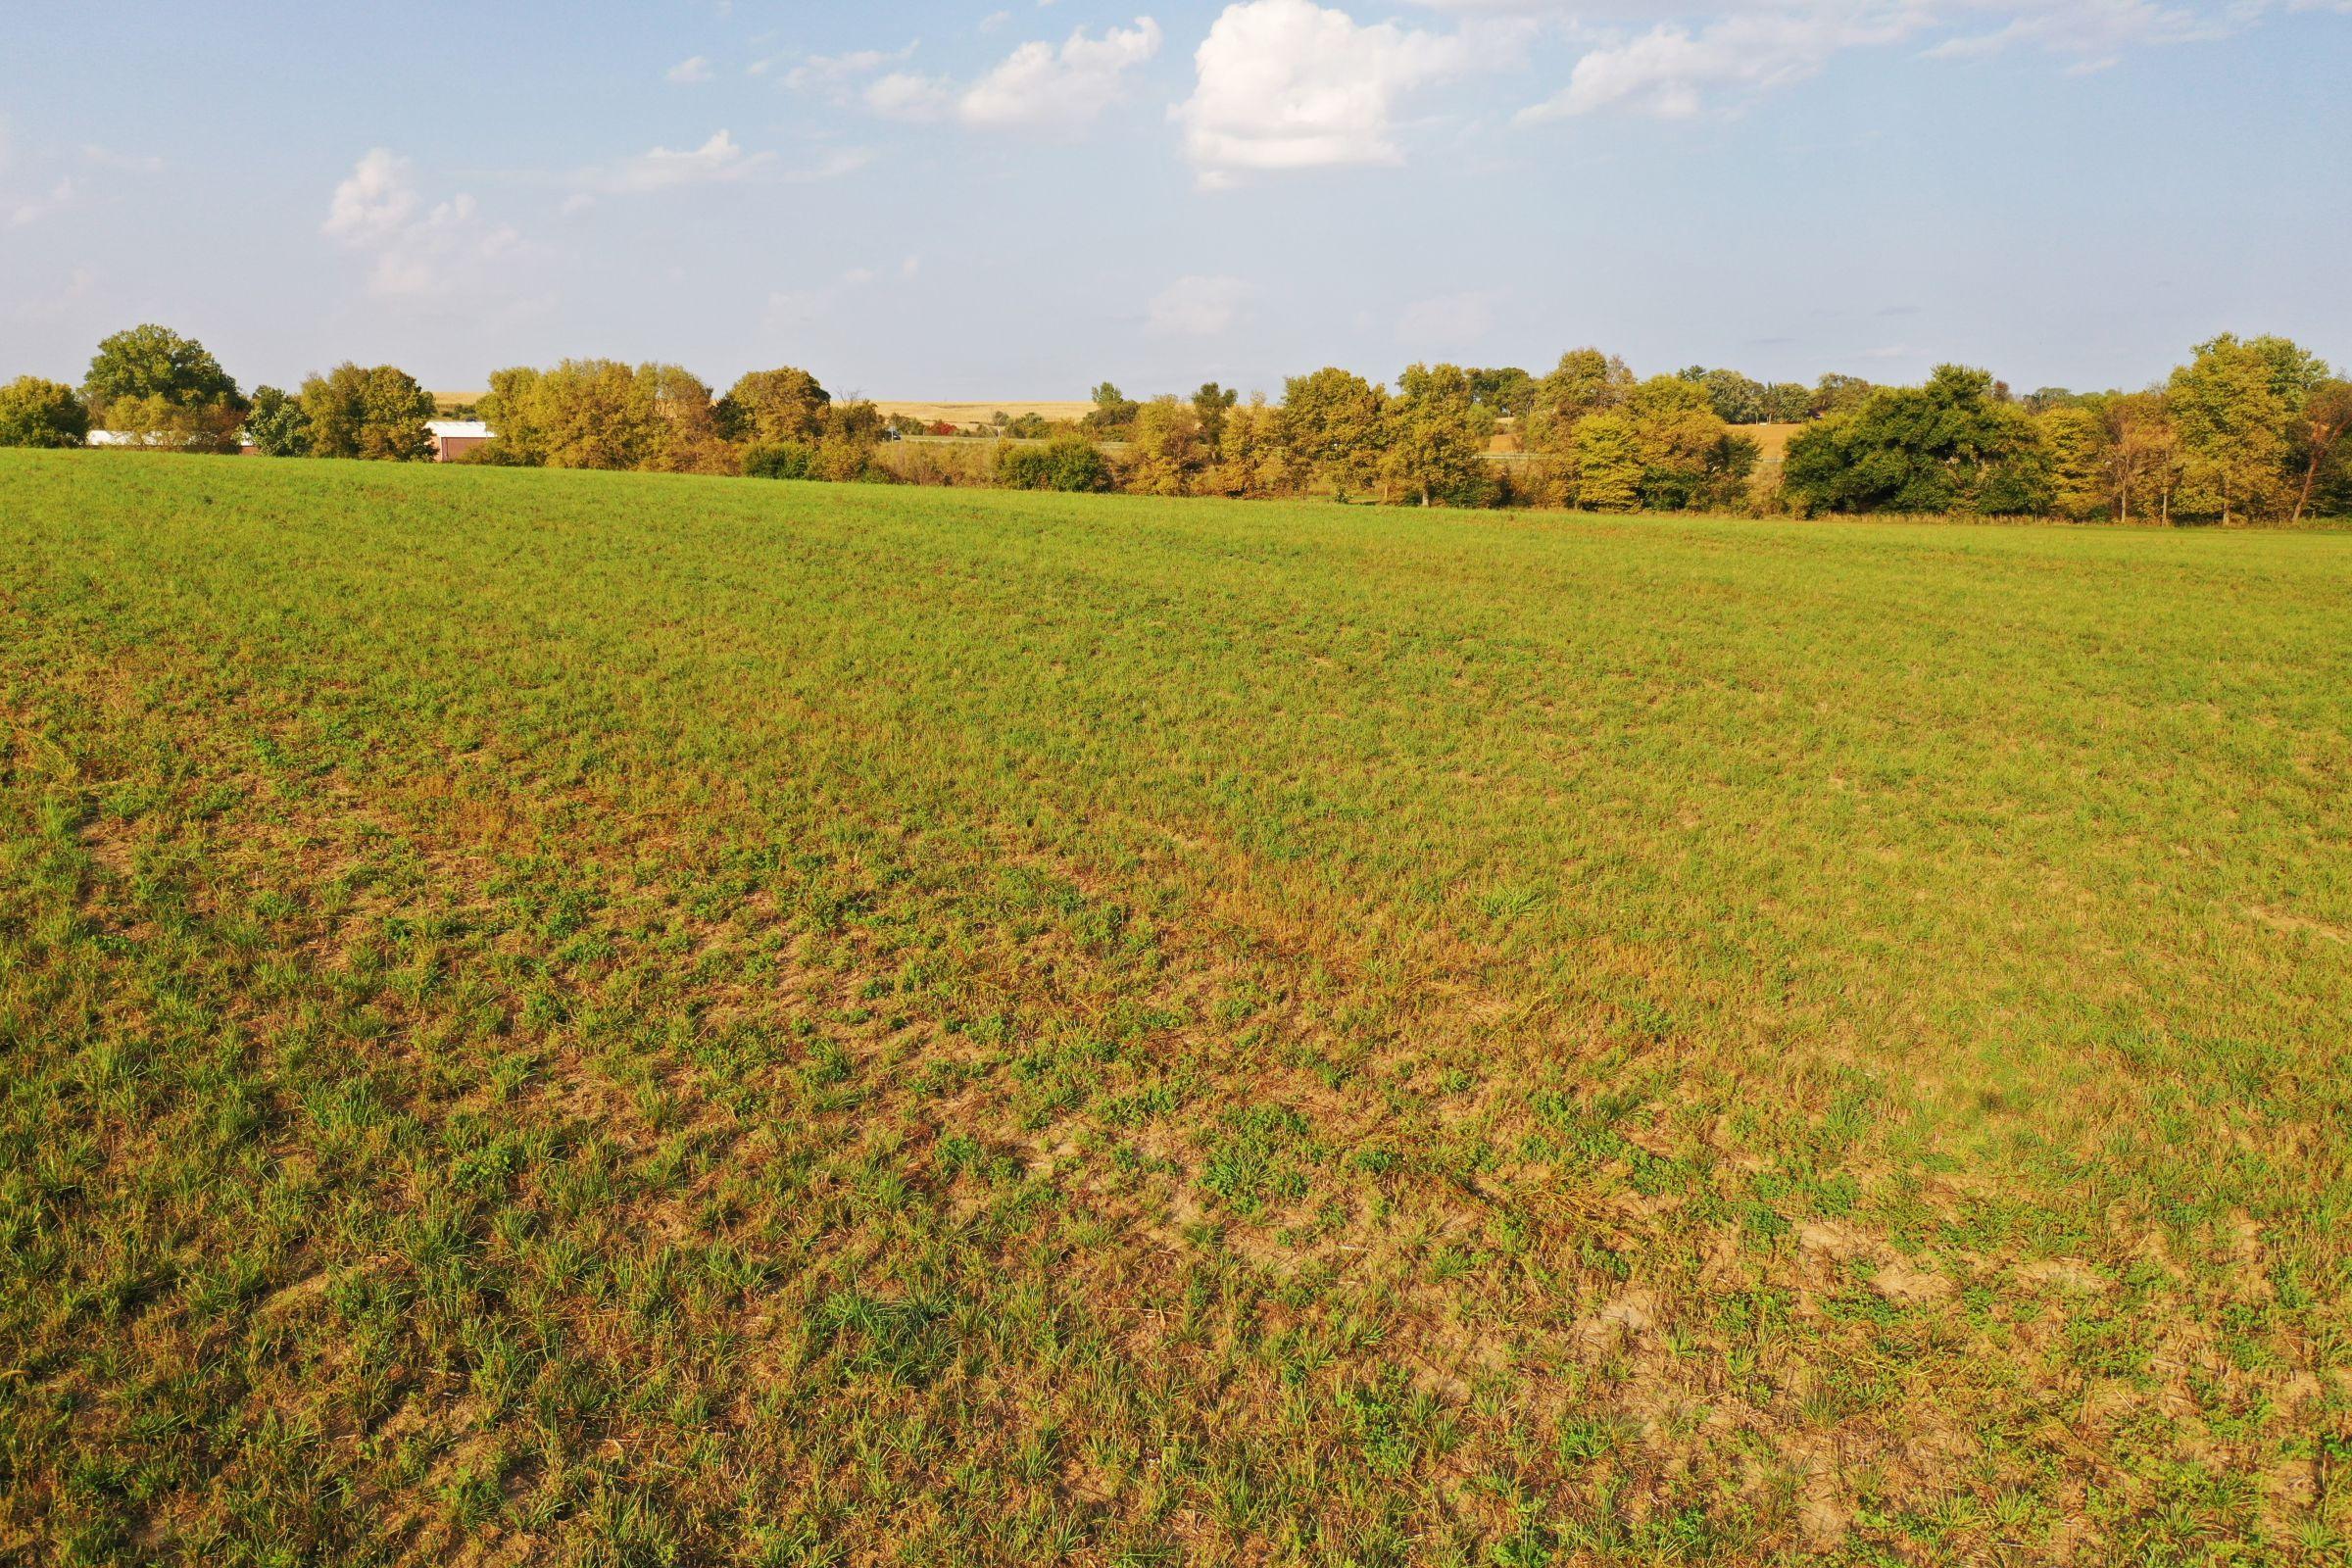 land-warren-county-iowa-29-acres-listing-number-14919-2-2020-10-12-170351.jpg